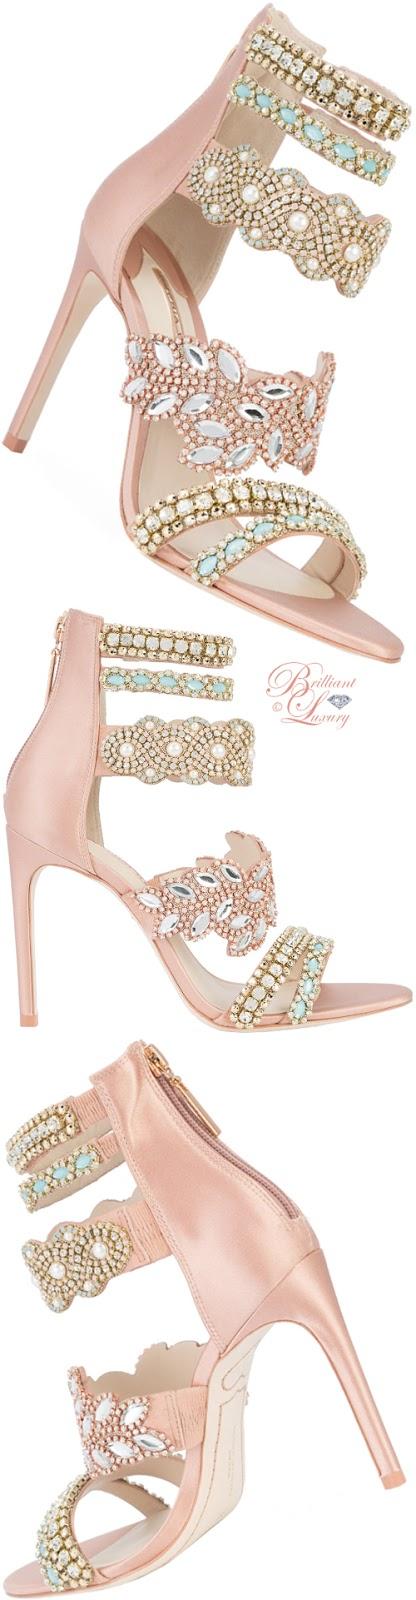 Brilliant Luxury ♦ Brilliant Luxury ♦ Sophia Webster beaded strap sandals